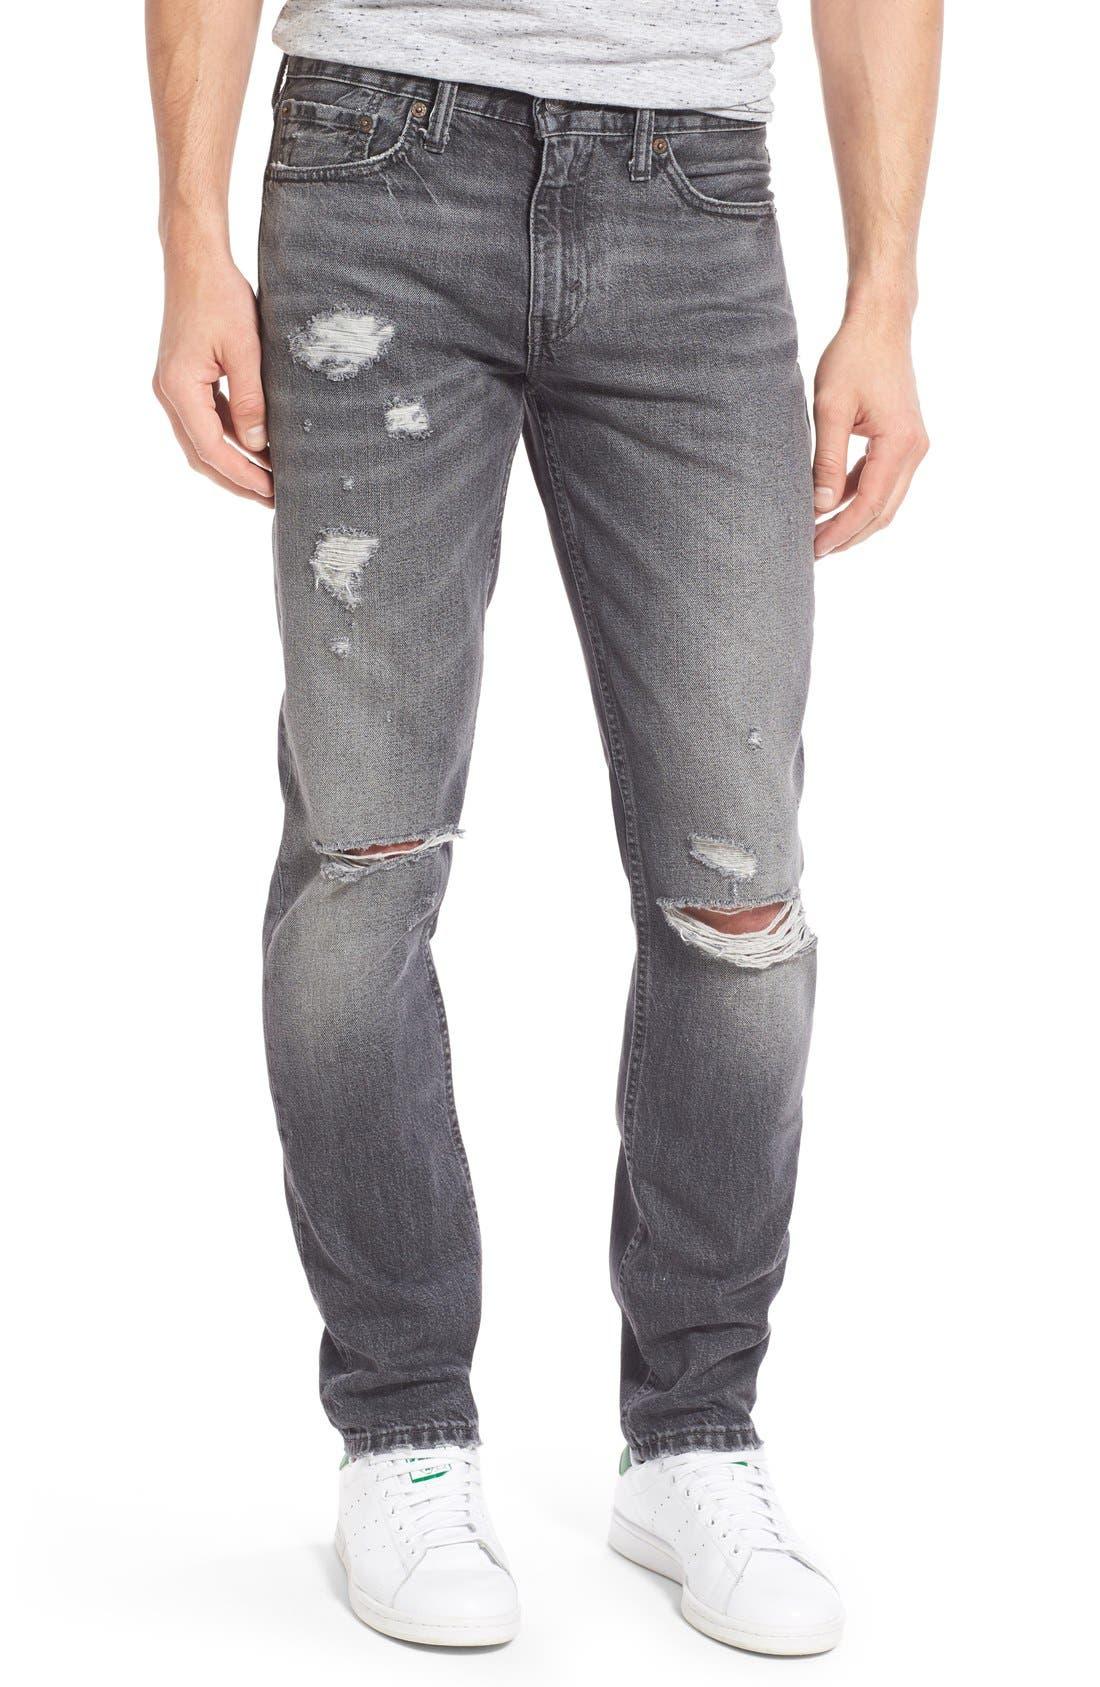 Alternate Image 1 Selected - Levi's® 511™ Slim Fit Jeans (Antique Rust)